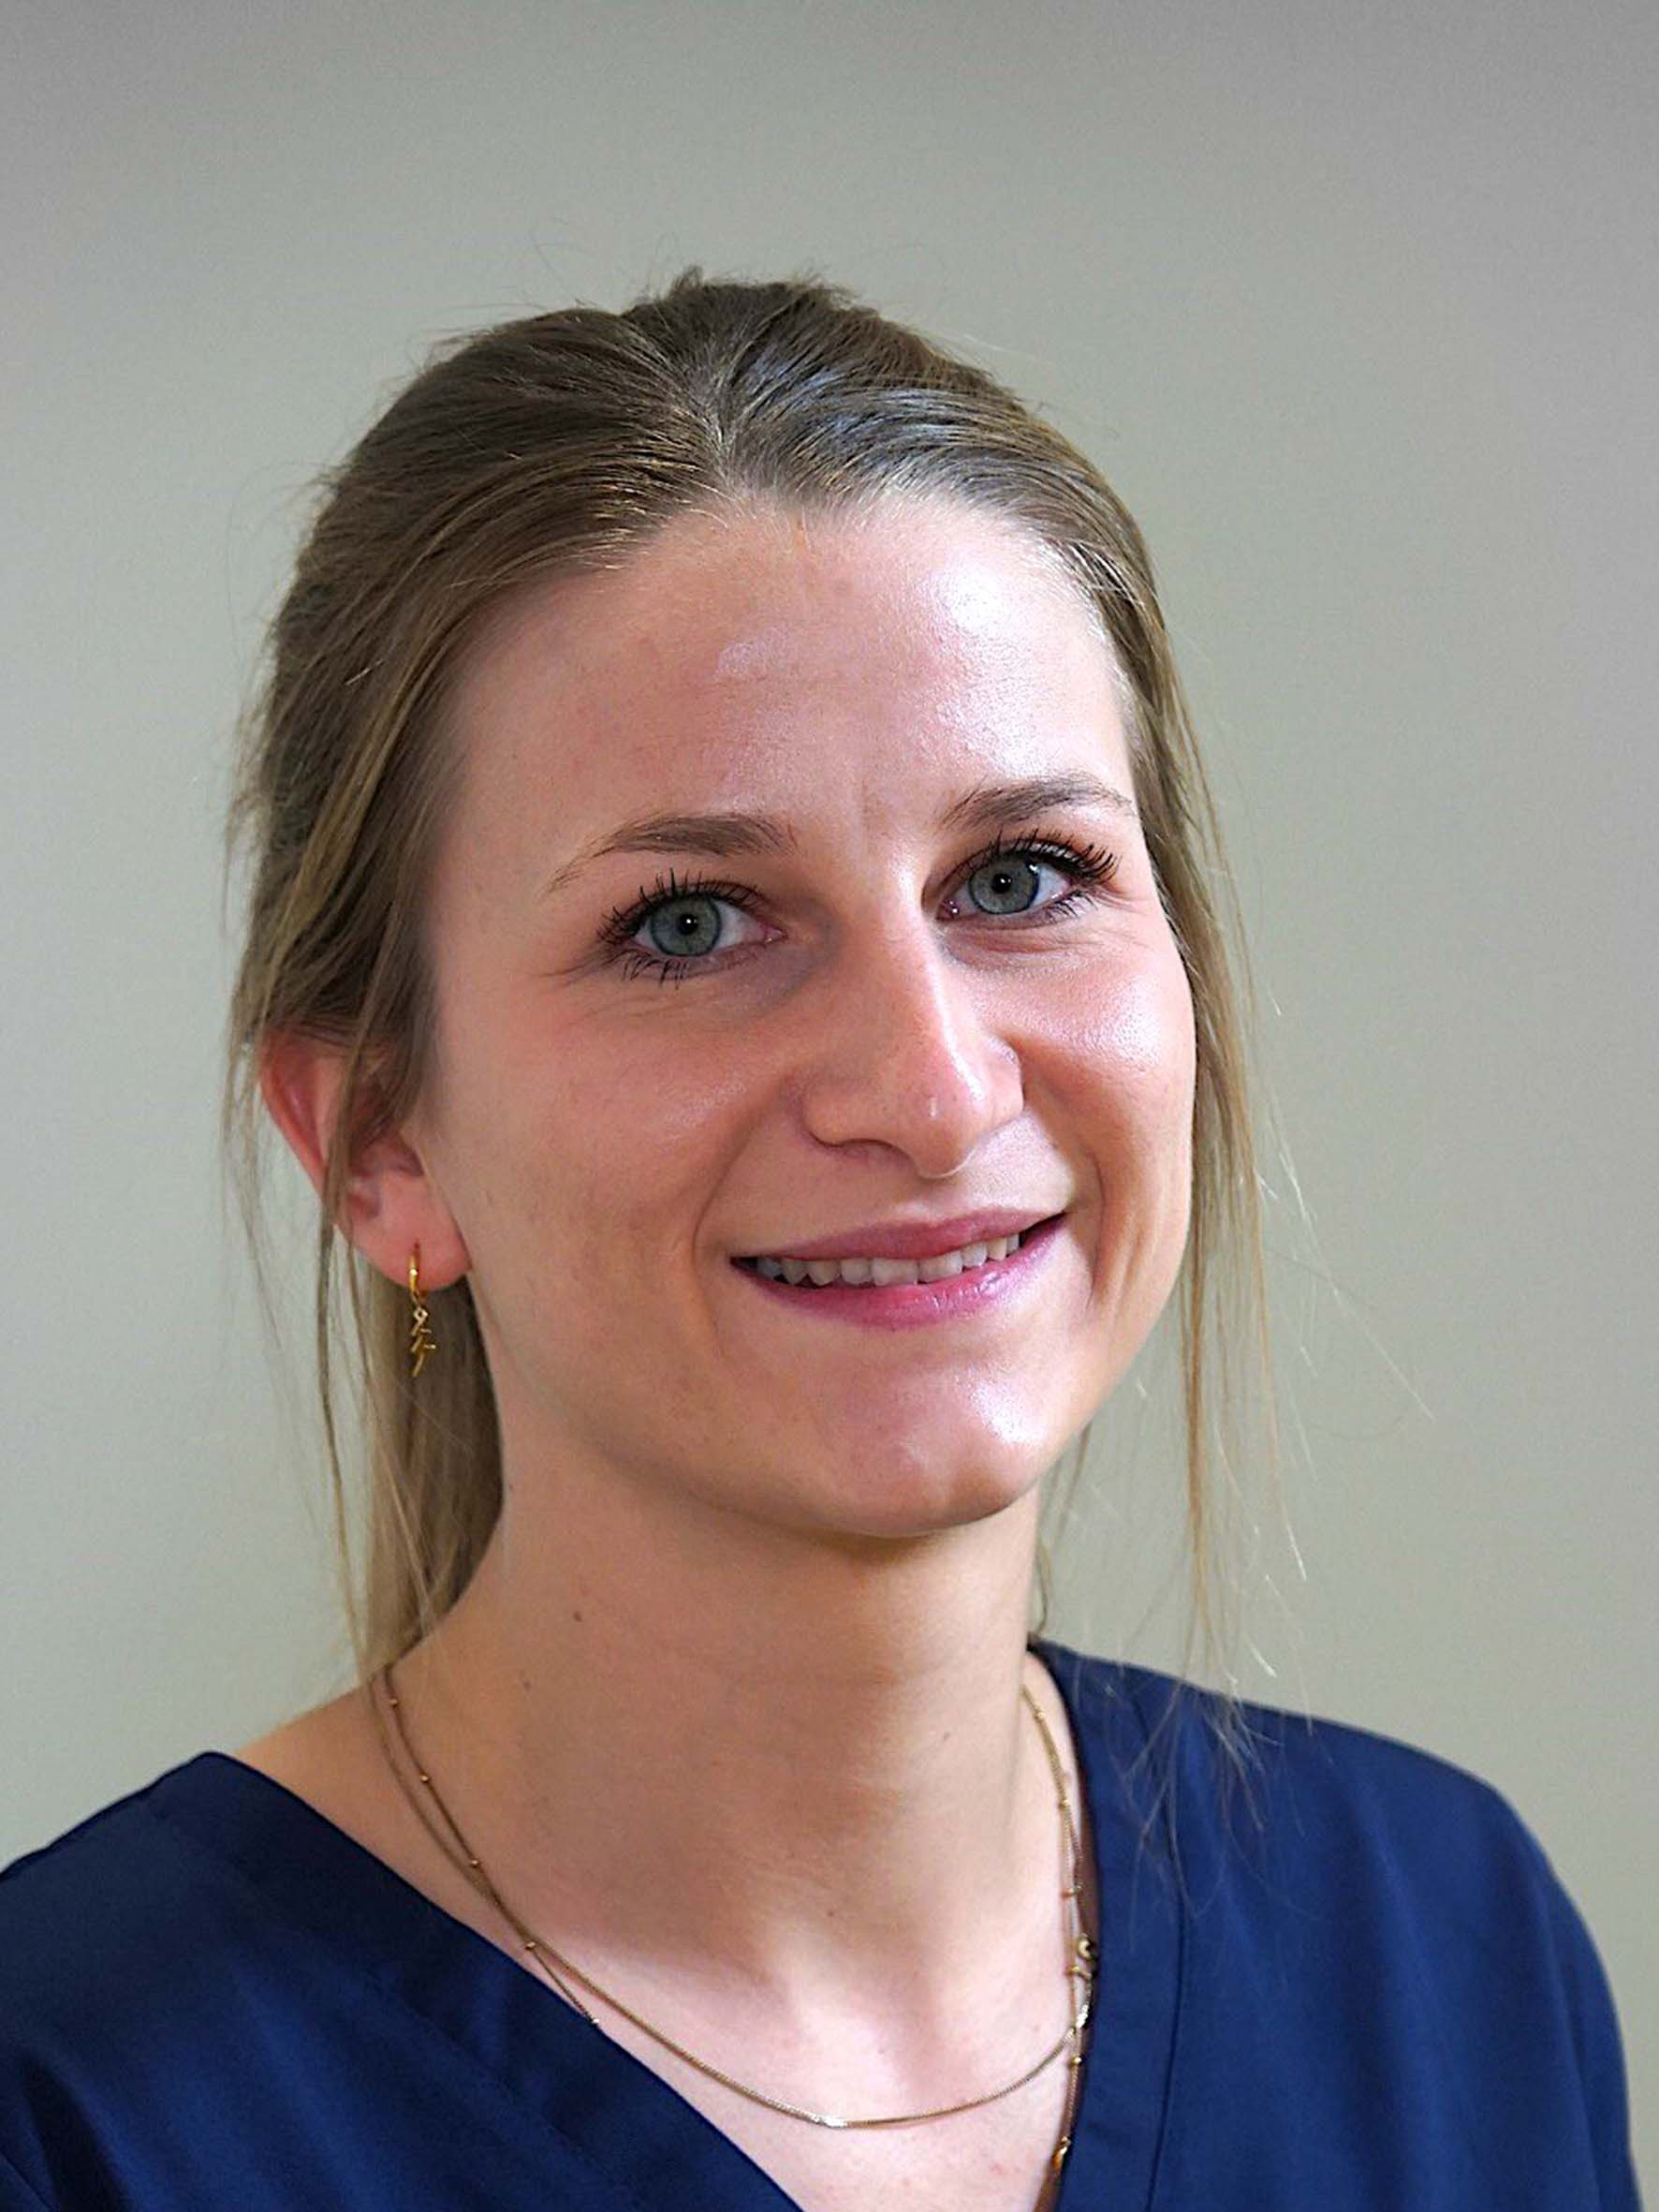 Ana Belen Castro - Parodontologie/Implantologie